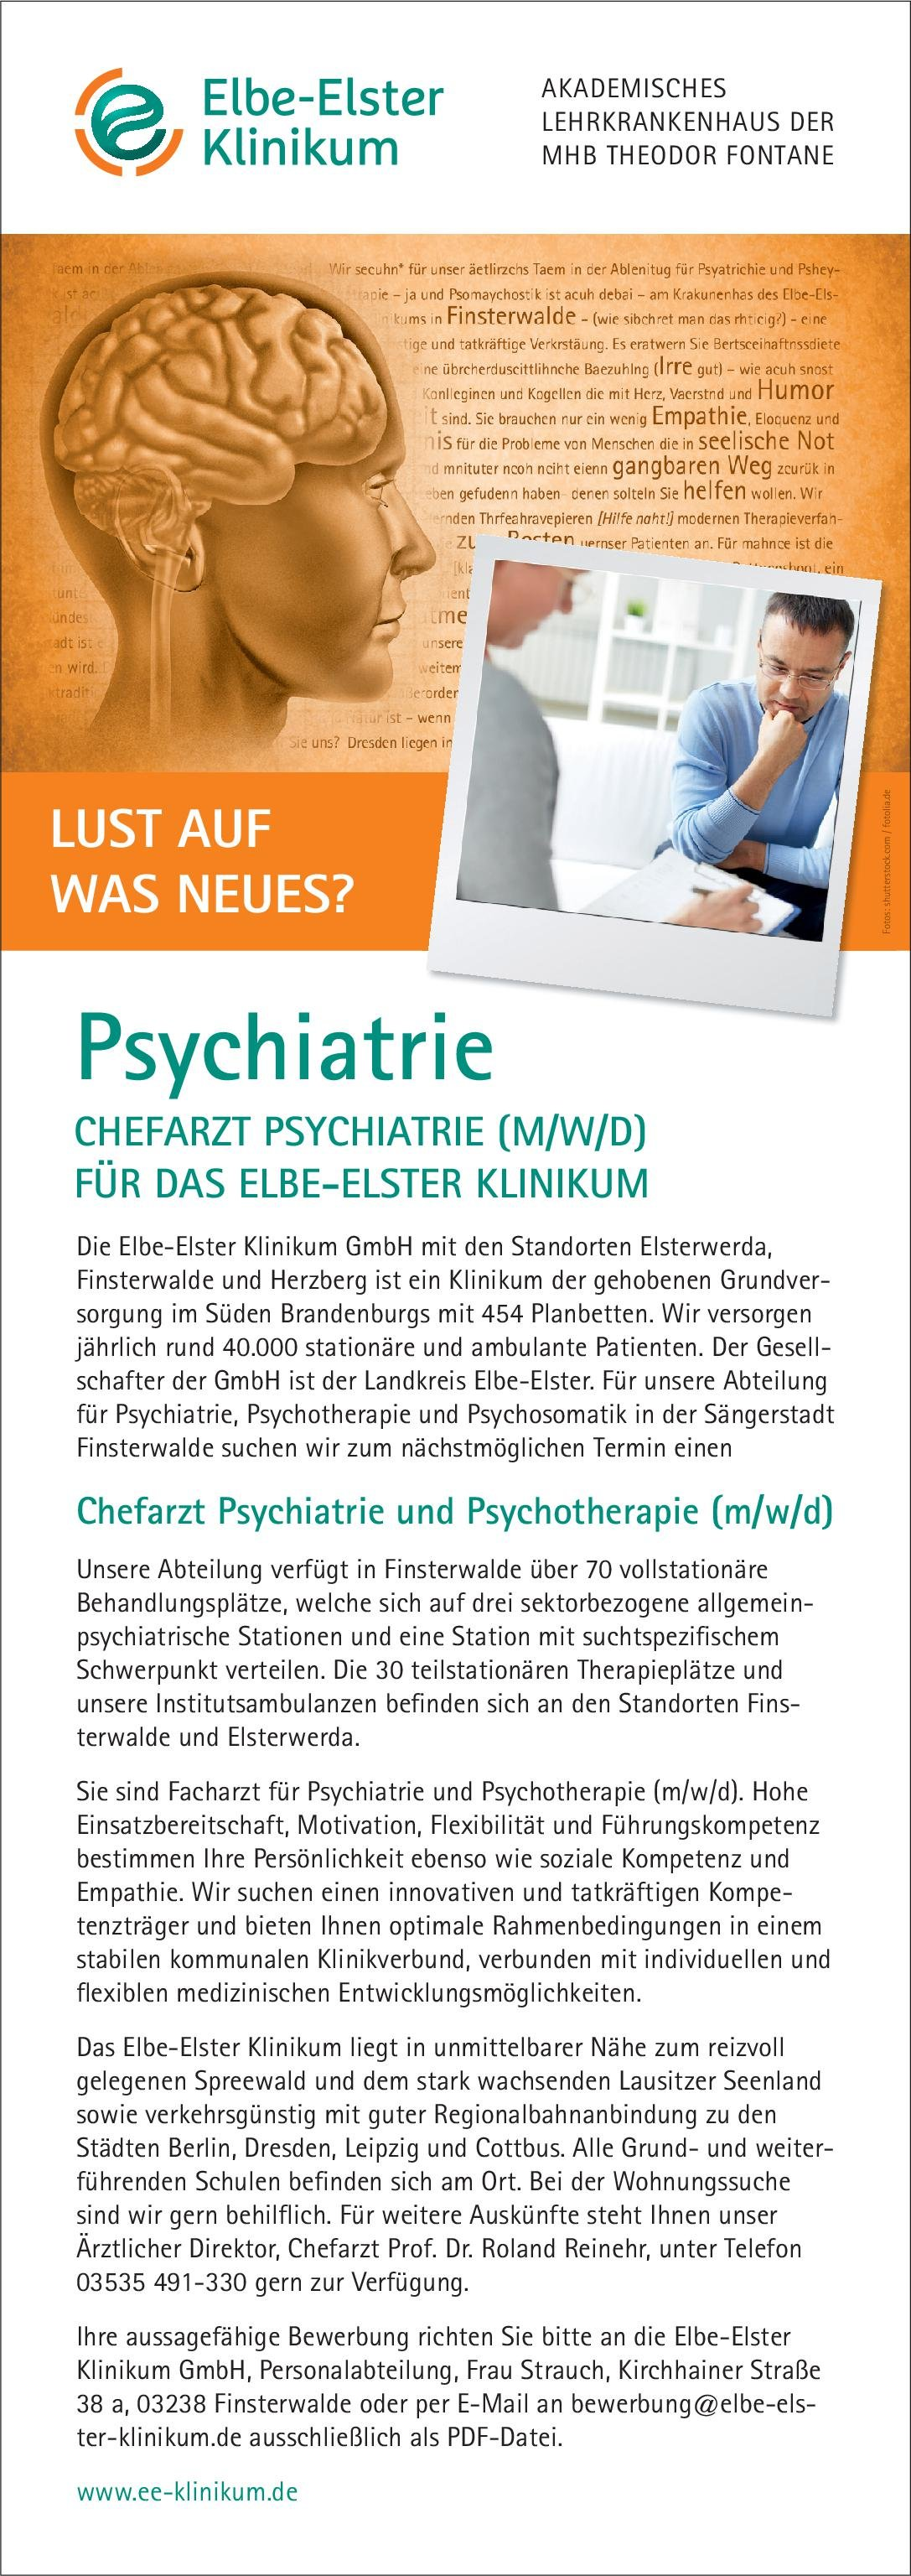 Elbe-Elster Klinikum Chefarzt ( m/w/d) für Psychiatrie  Psychiatrie und Psychotherapie, Psychiatrie und Psychotherapie Chefarzt